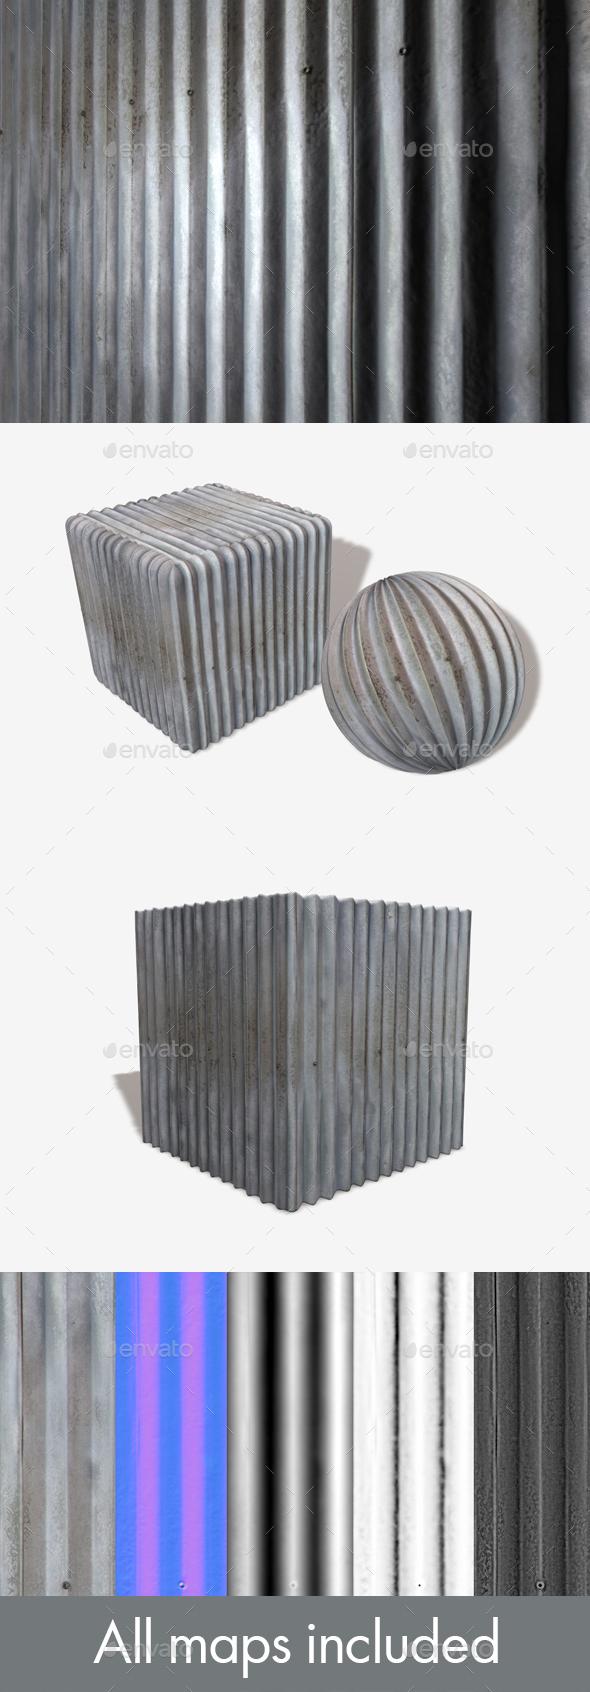 Metal Panel Seamless Texture - 3DOcean Item for Sale